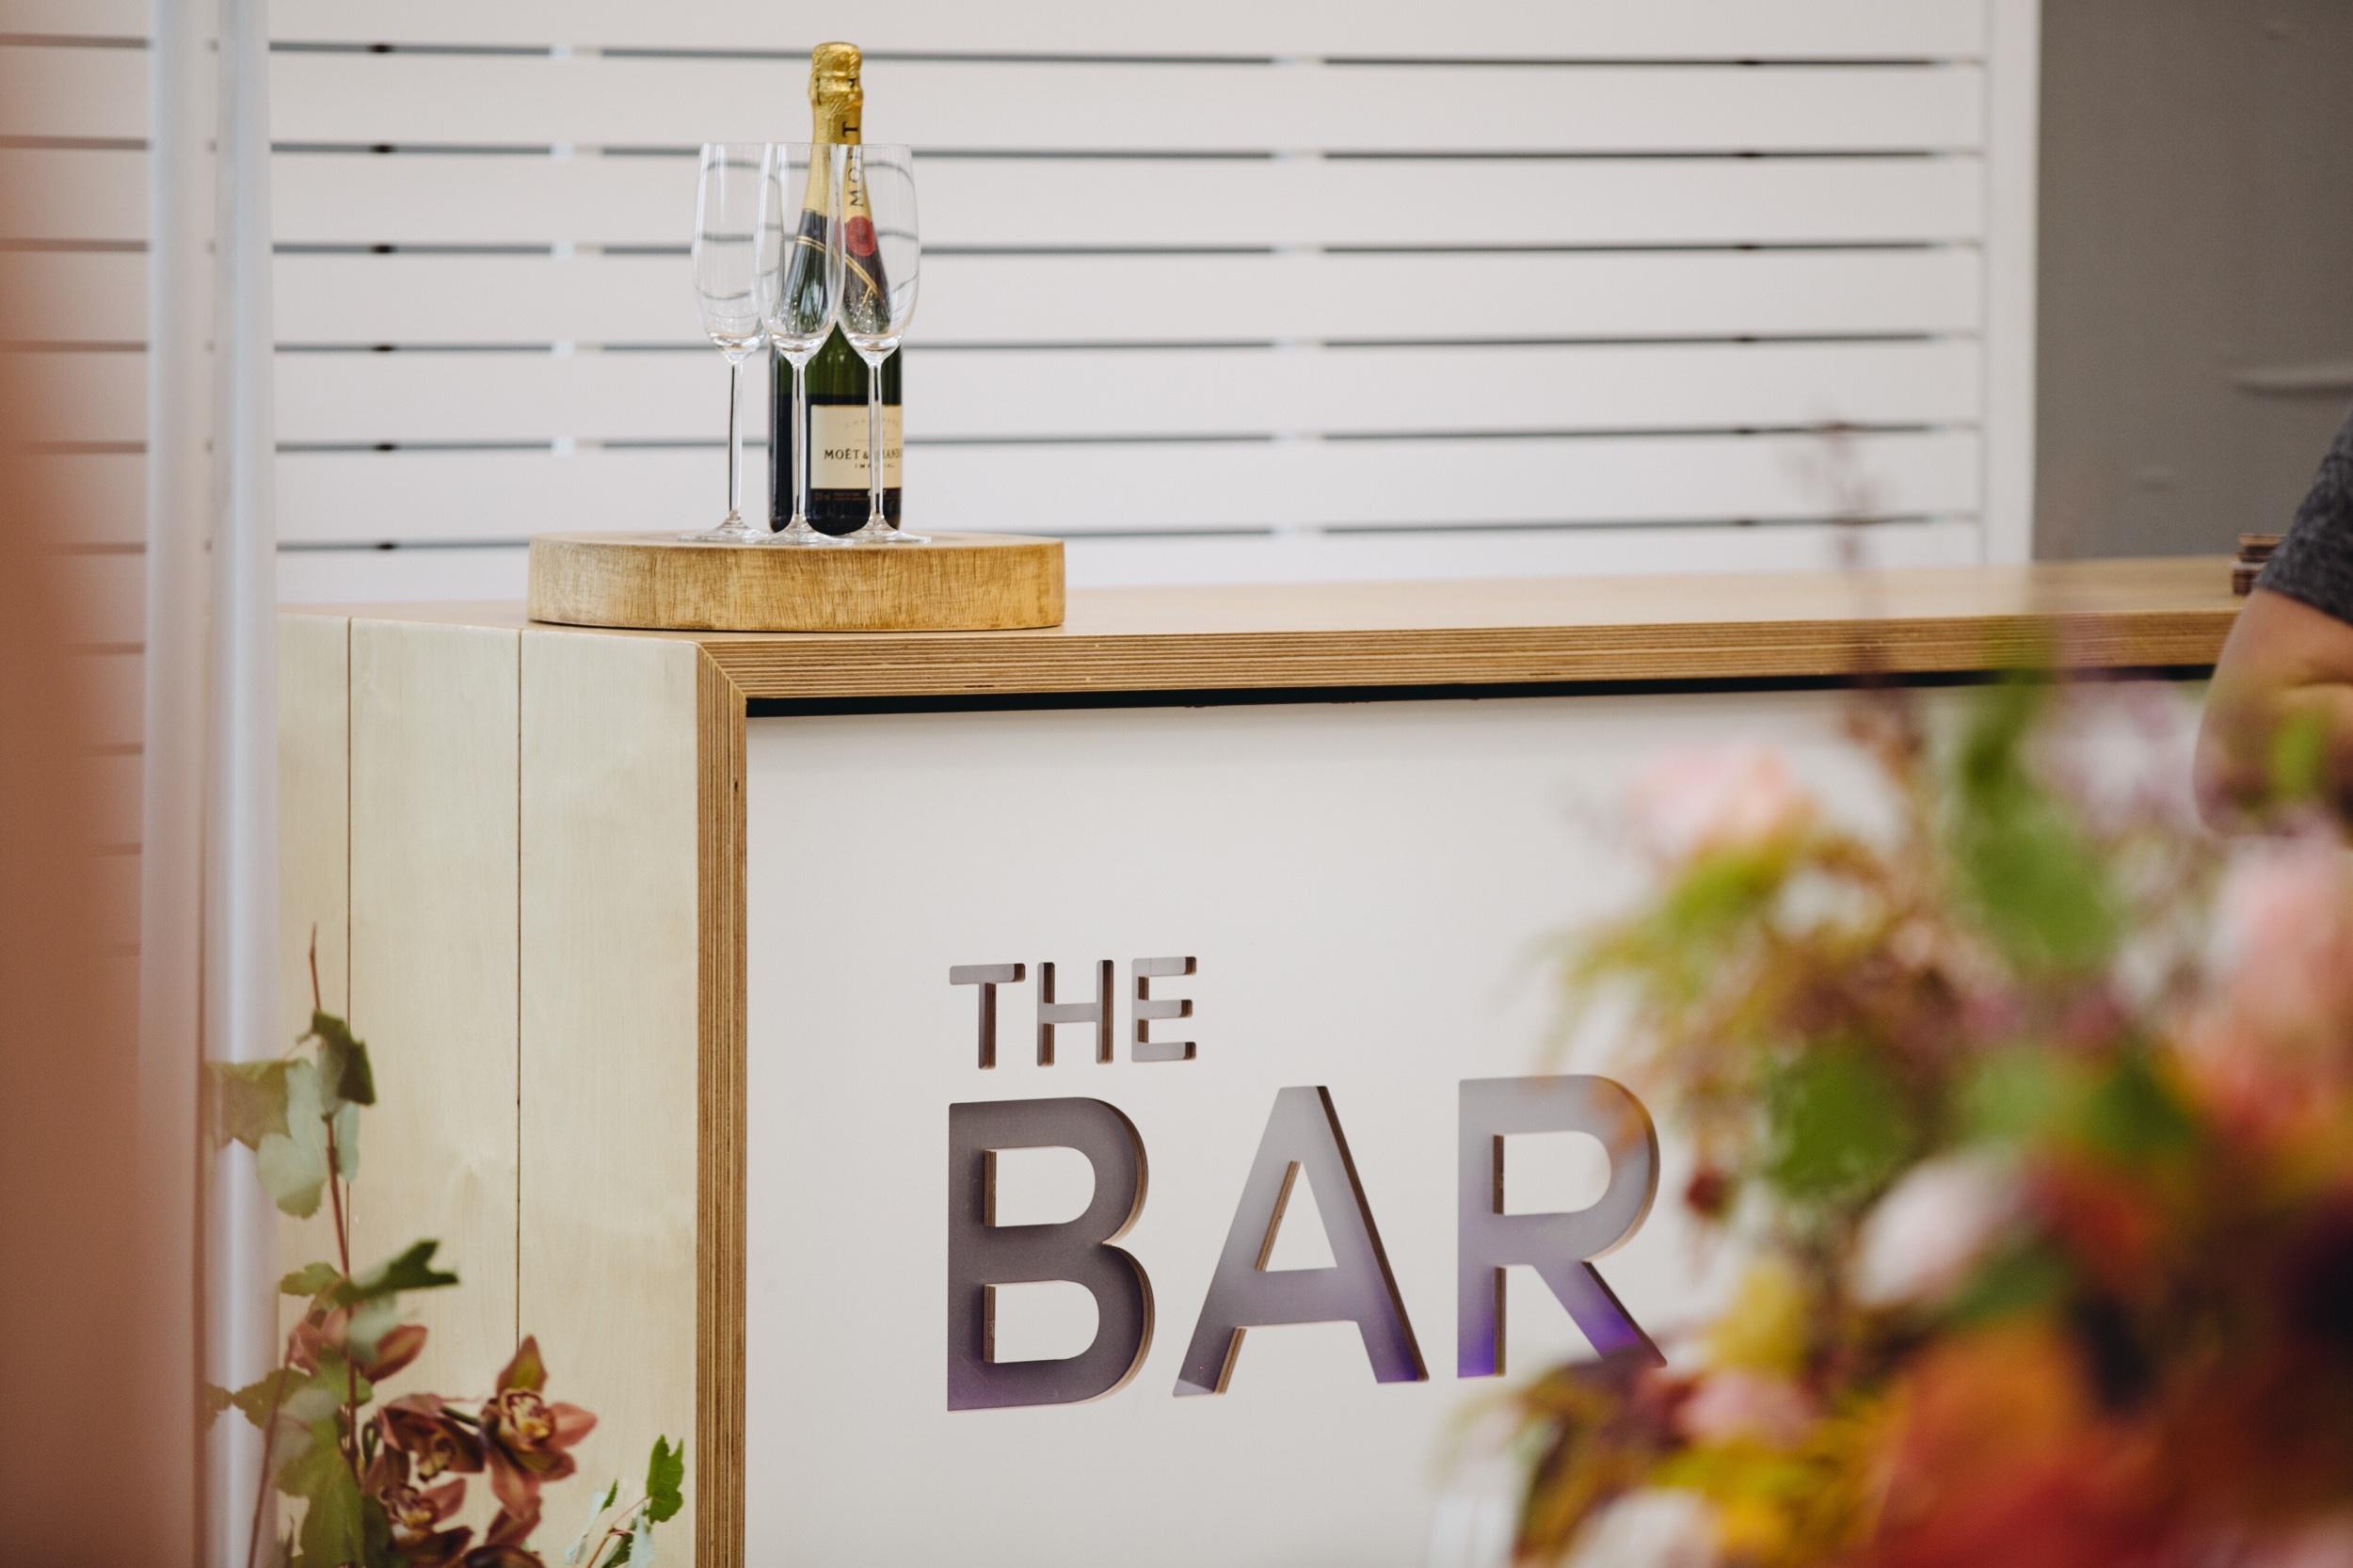 The bar - $150